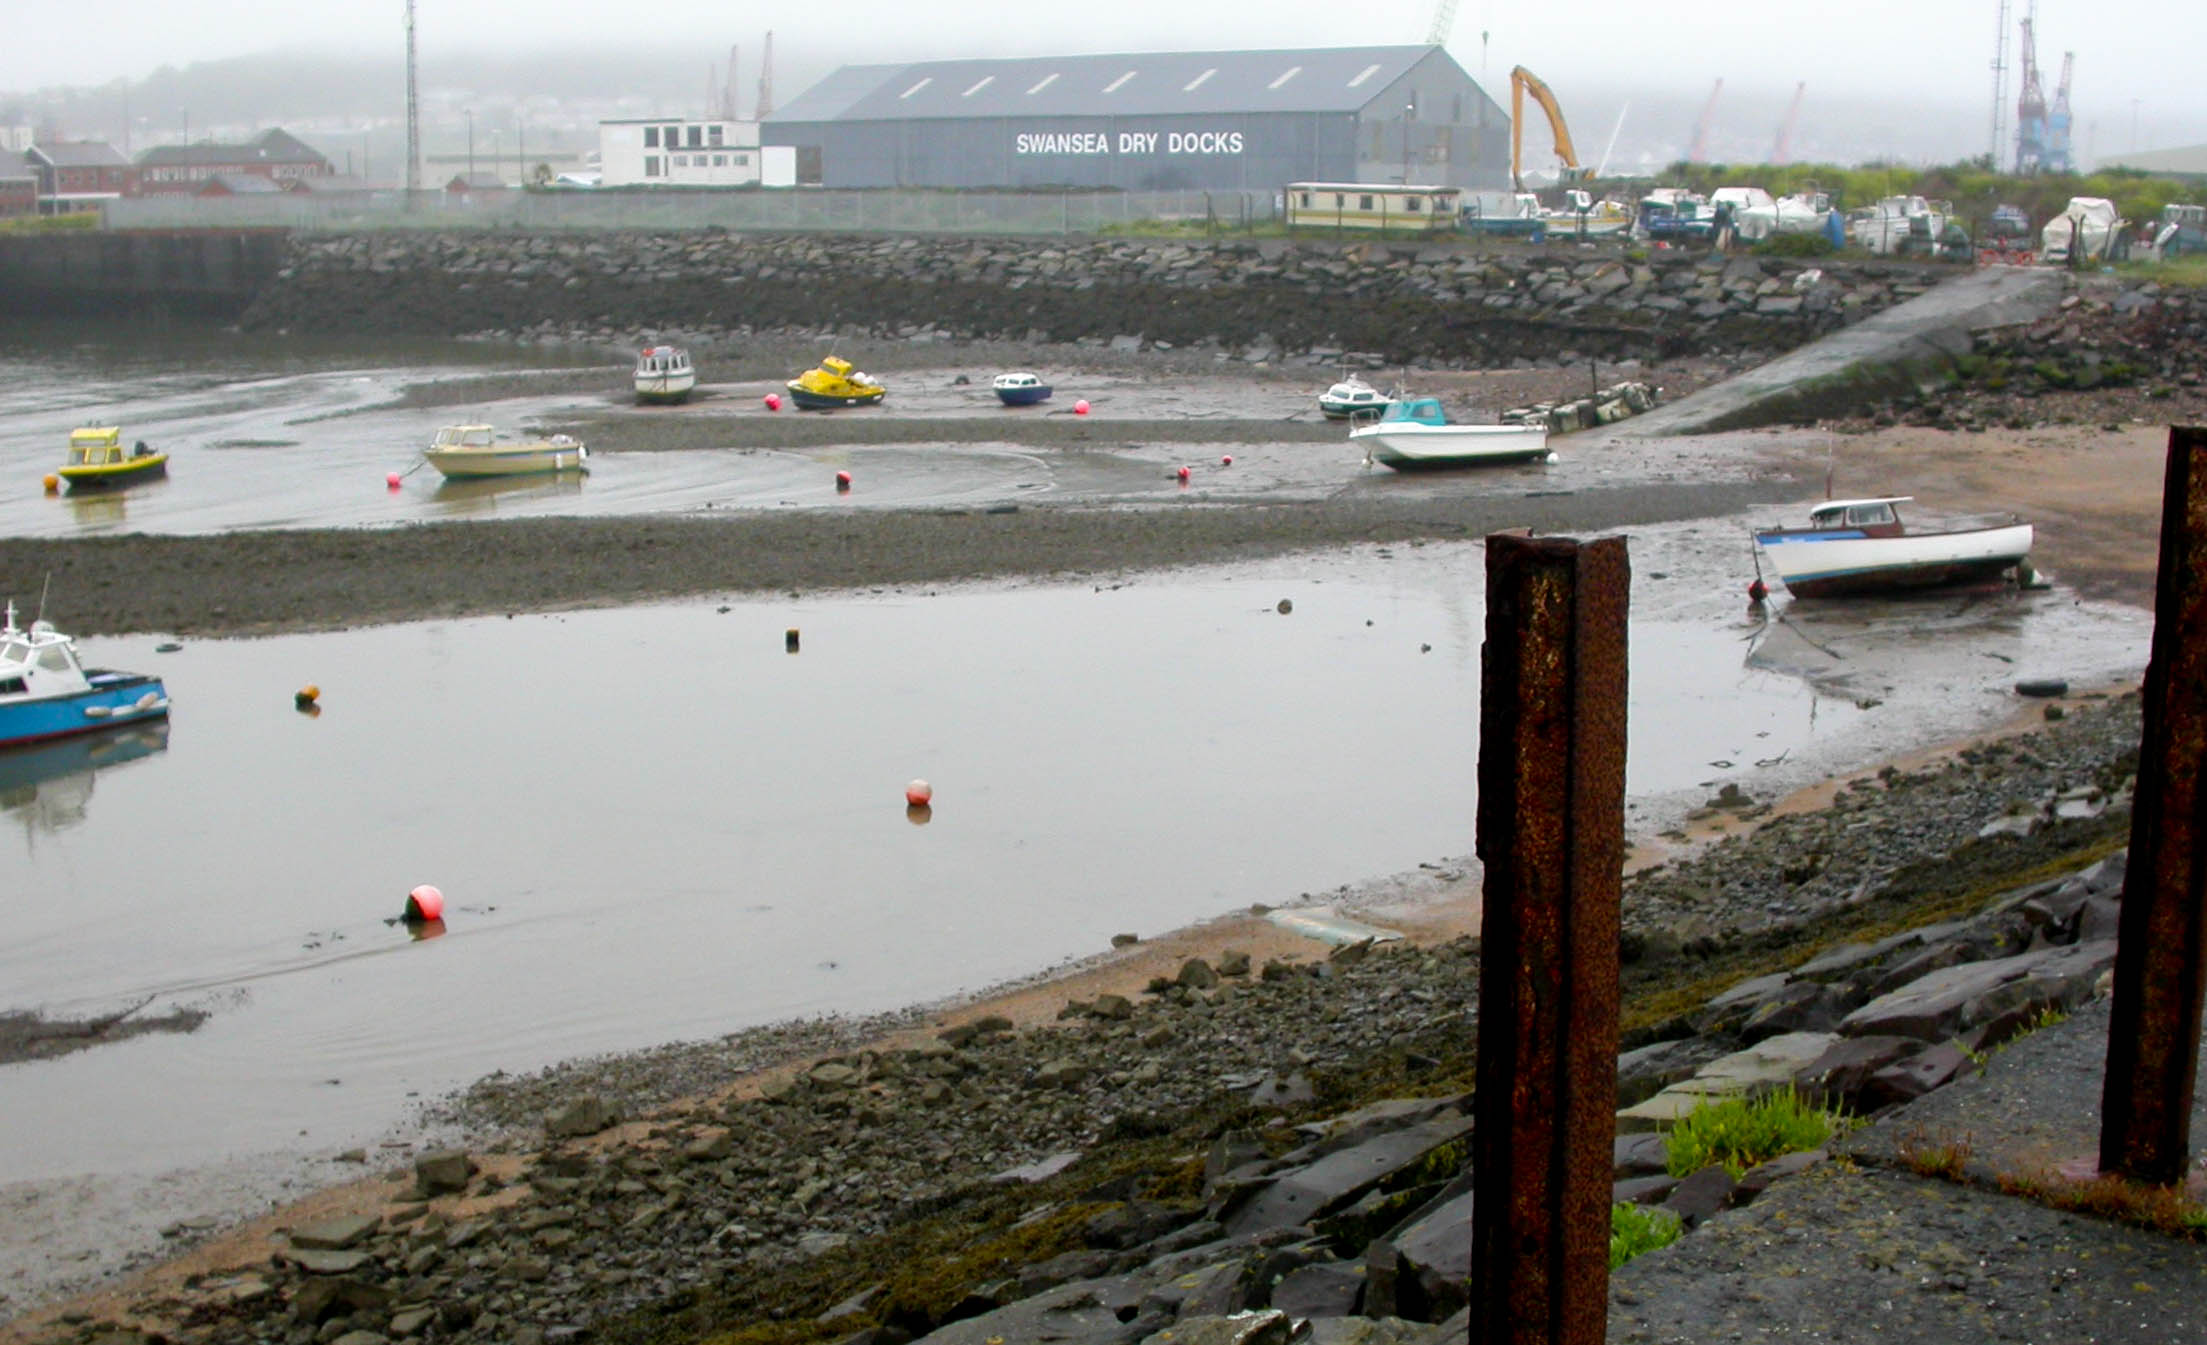 Swansea Dock